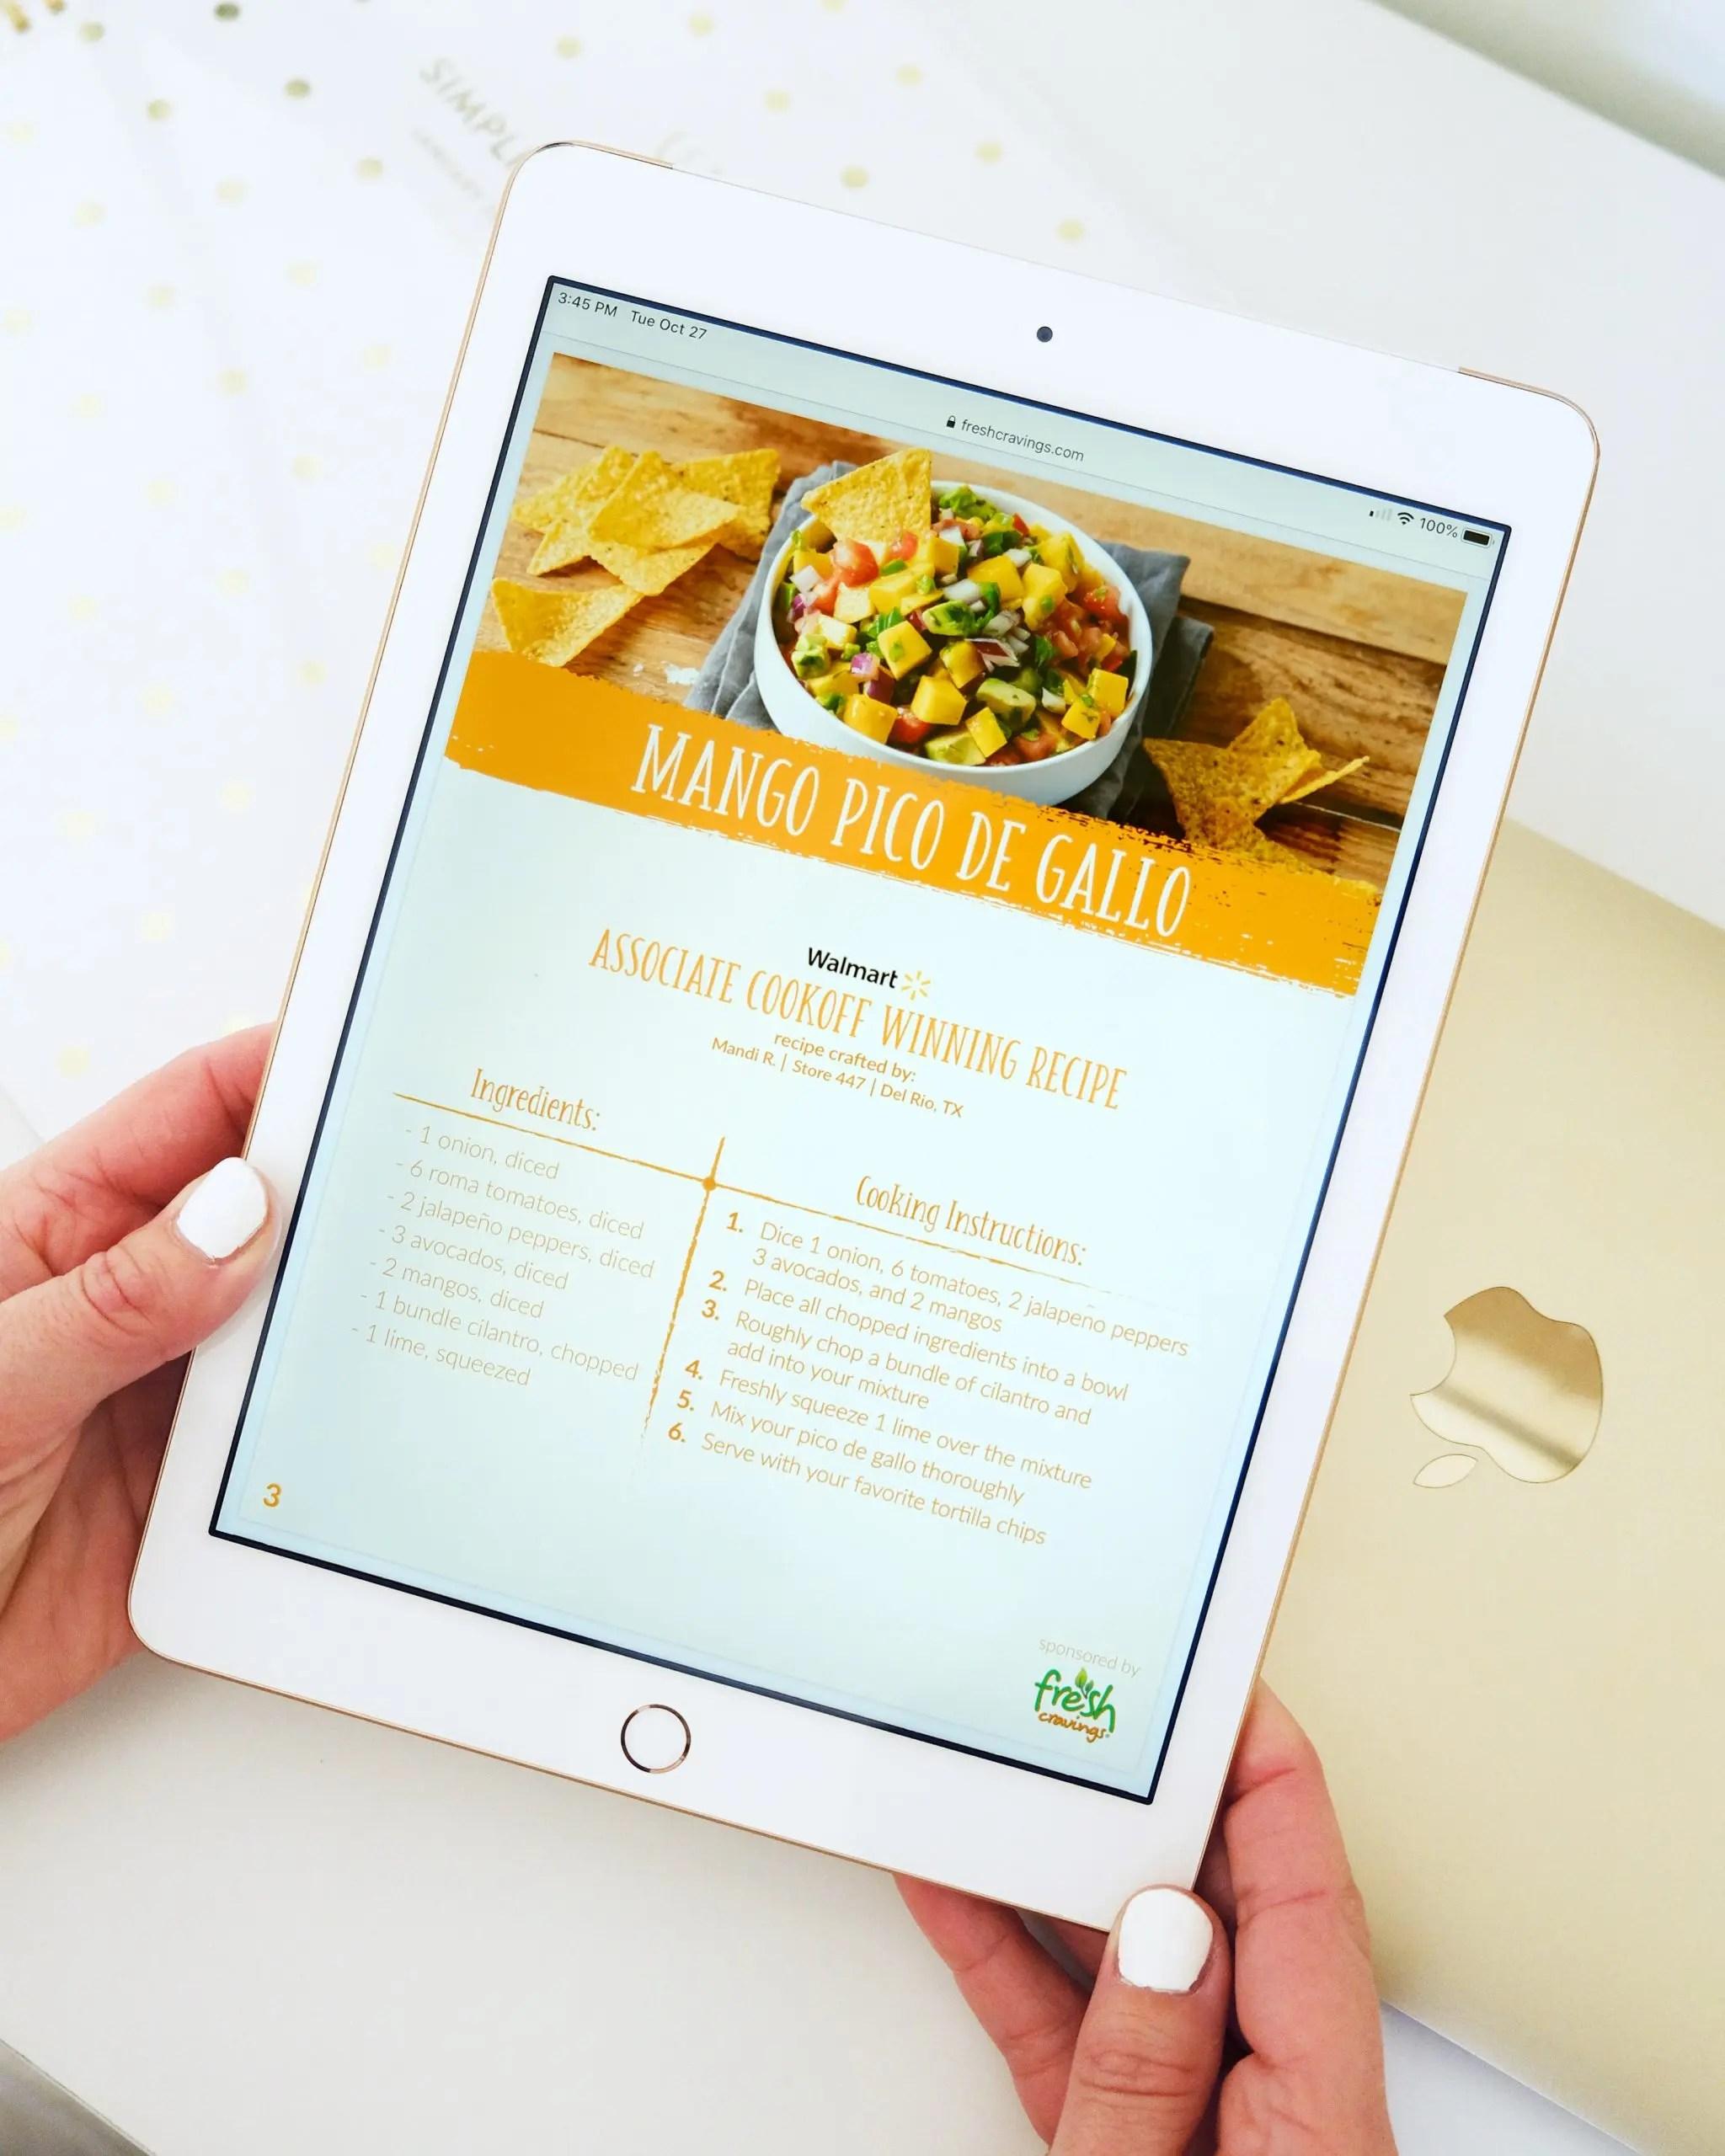 Walmart Associate Cookoff Recipe E-Book